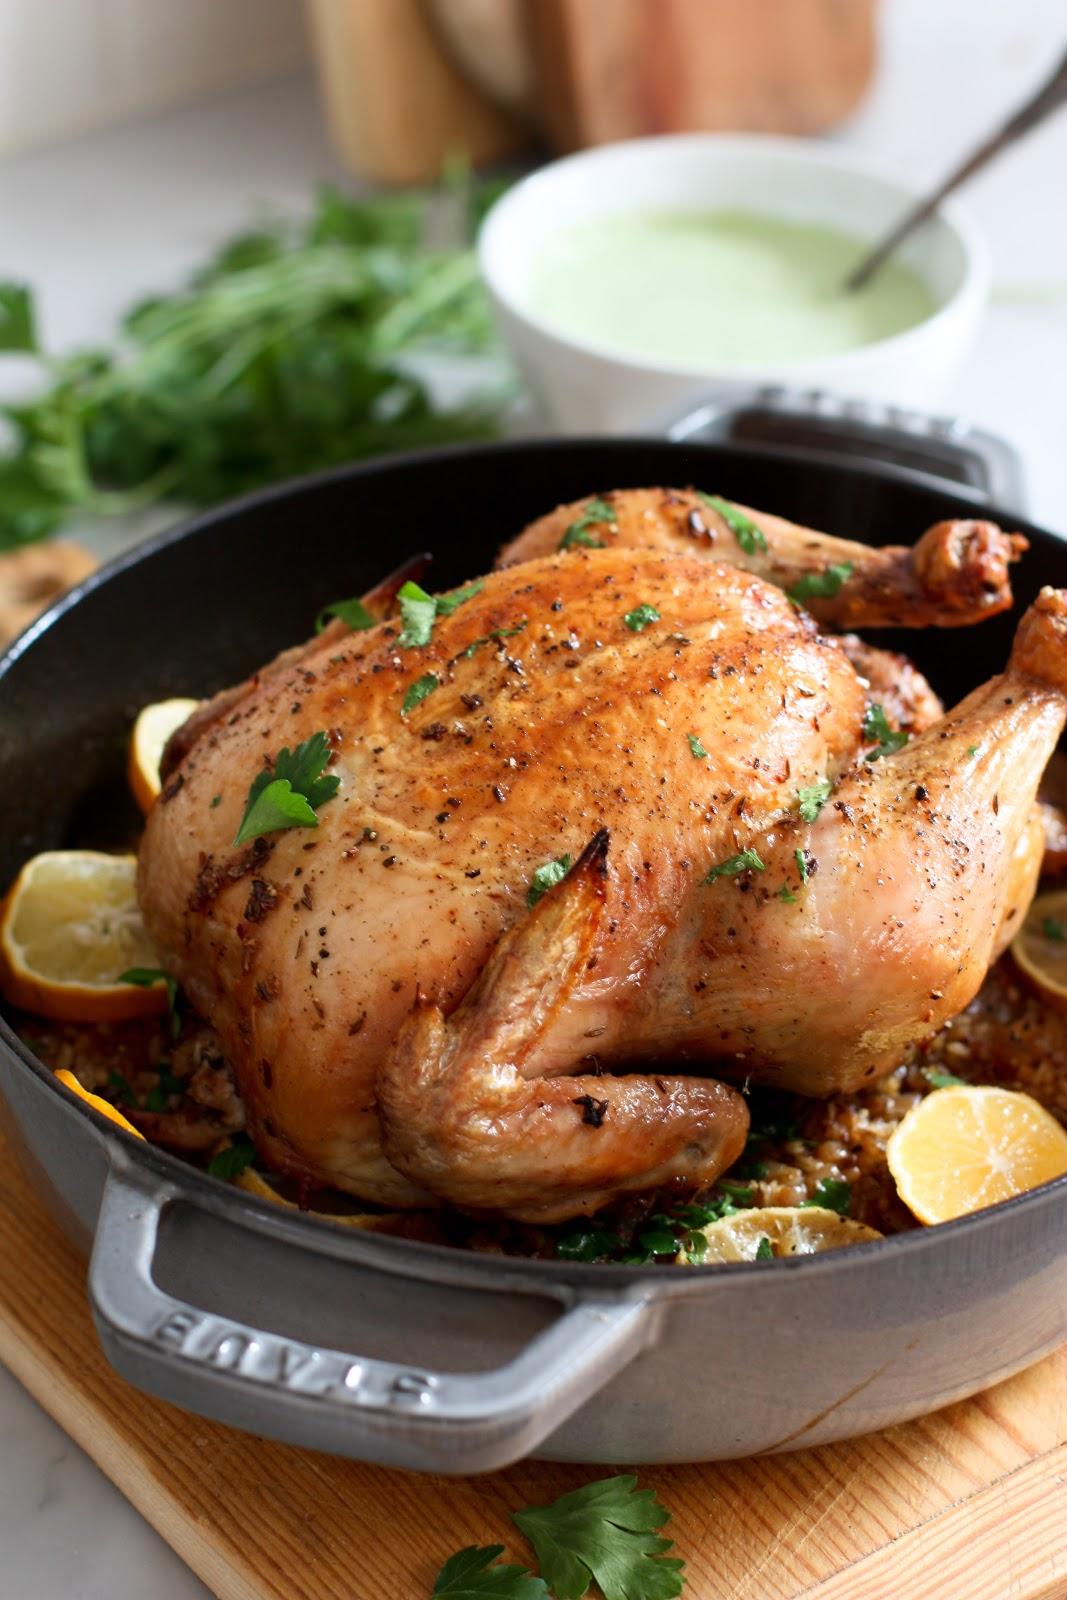 Roasted Chicken w/ Harissa Rub, Saffron Rice and Parsley Sauce